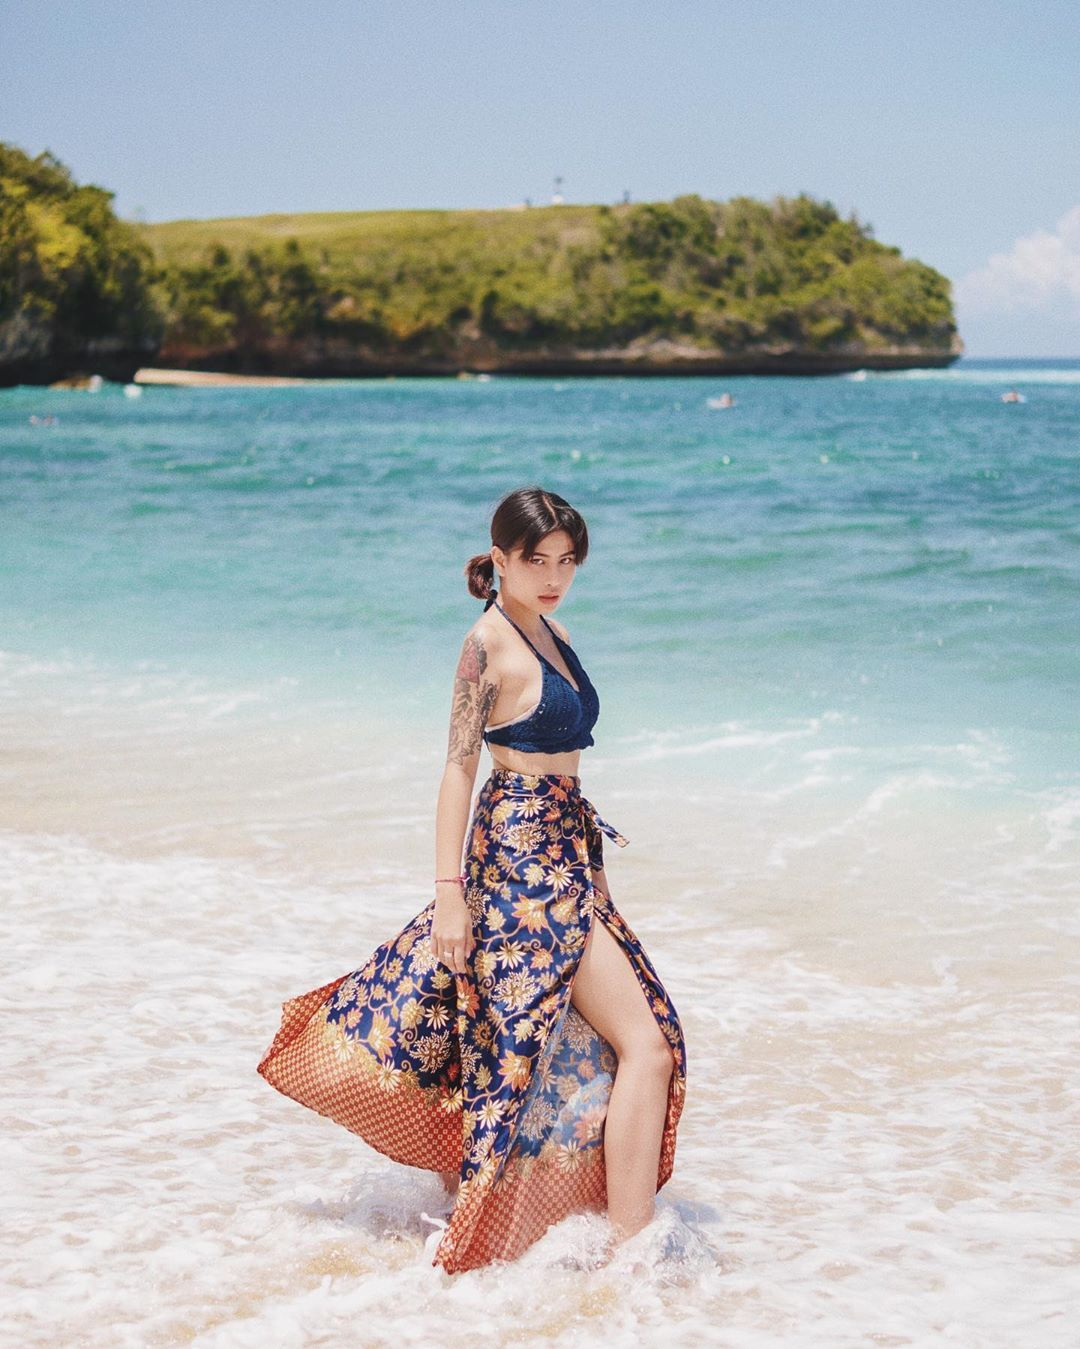 Wisata Pantai Balangan Bali Pilihan Awkarin - Dewata ID